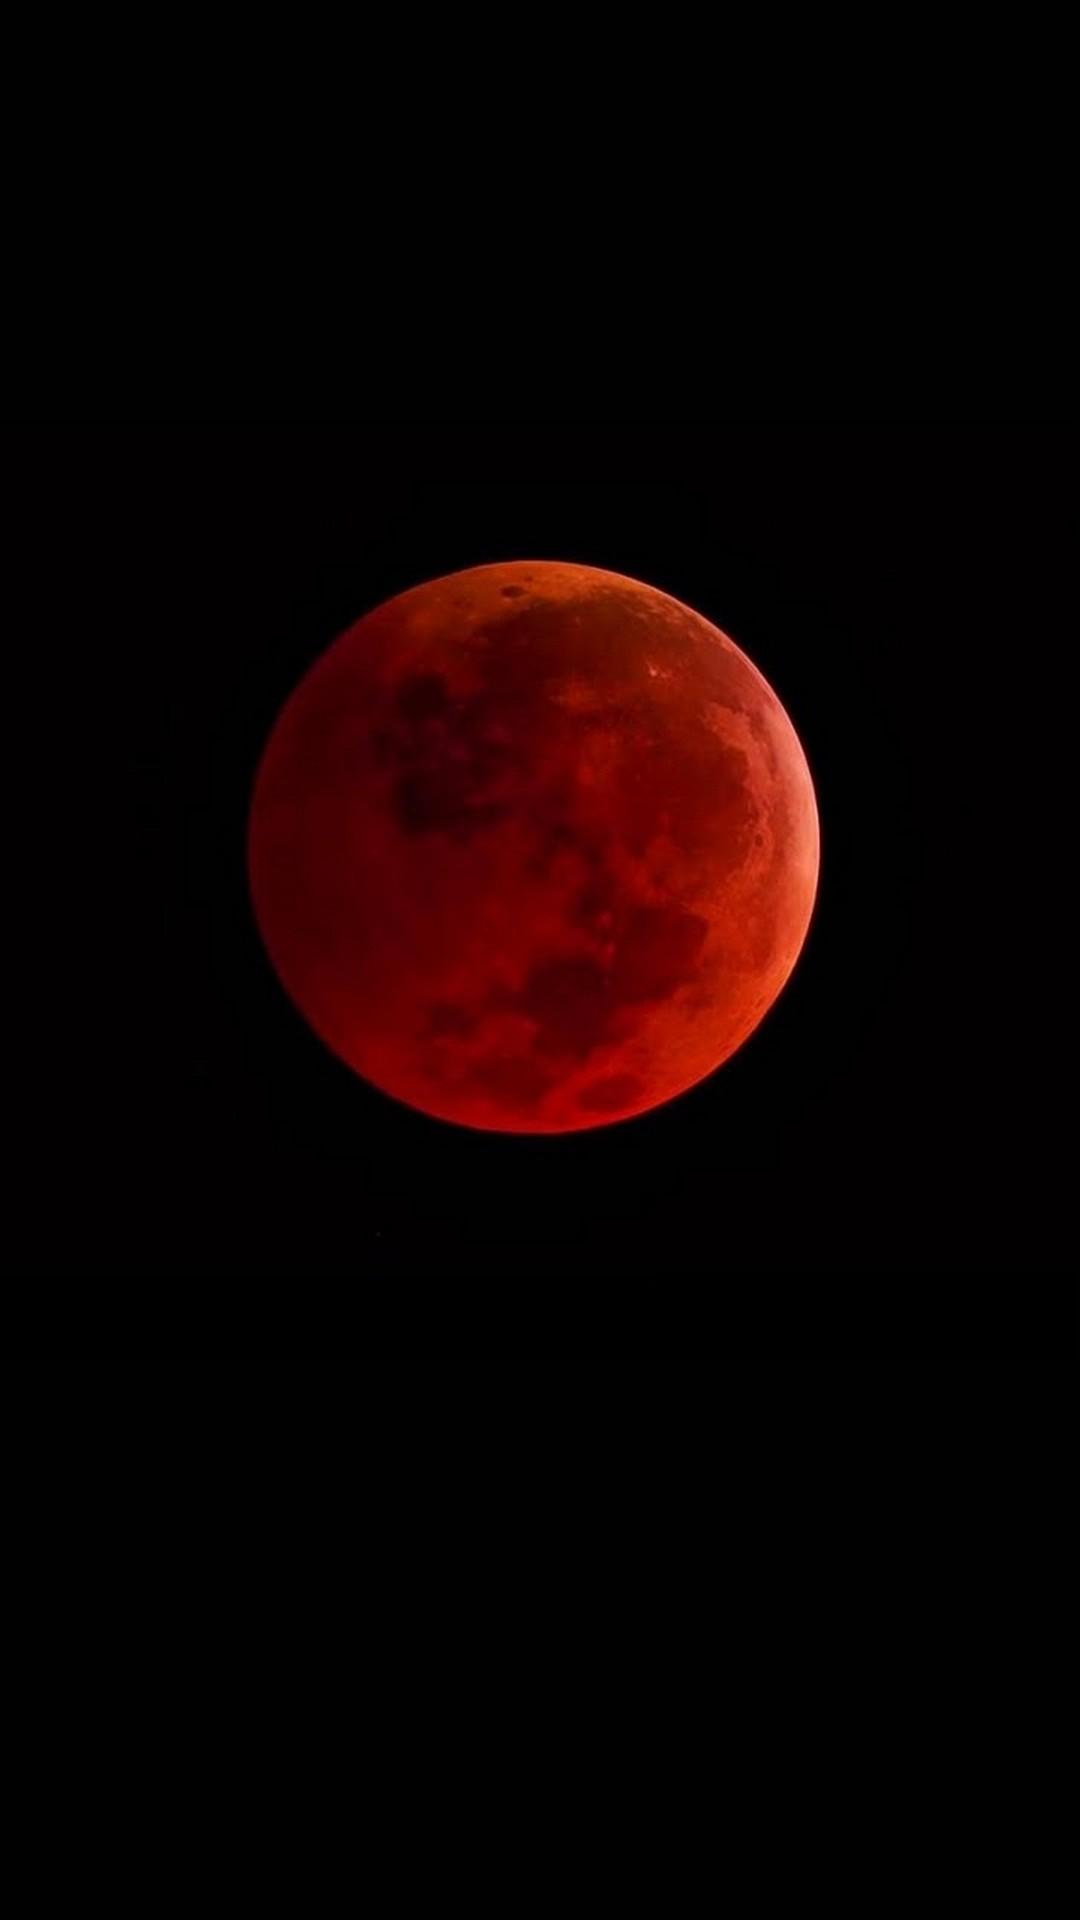 Blood Moon iPhone Wallpaper 2019 3D iPhone Wallpaper 1080x1920